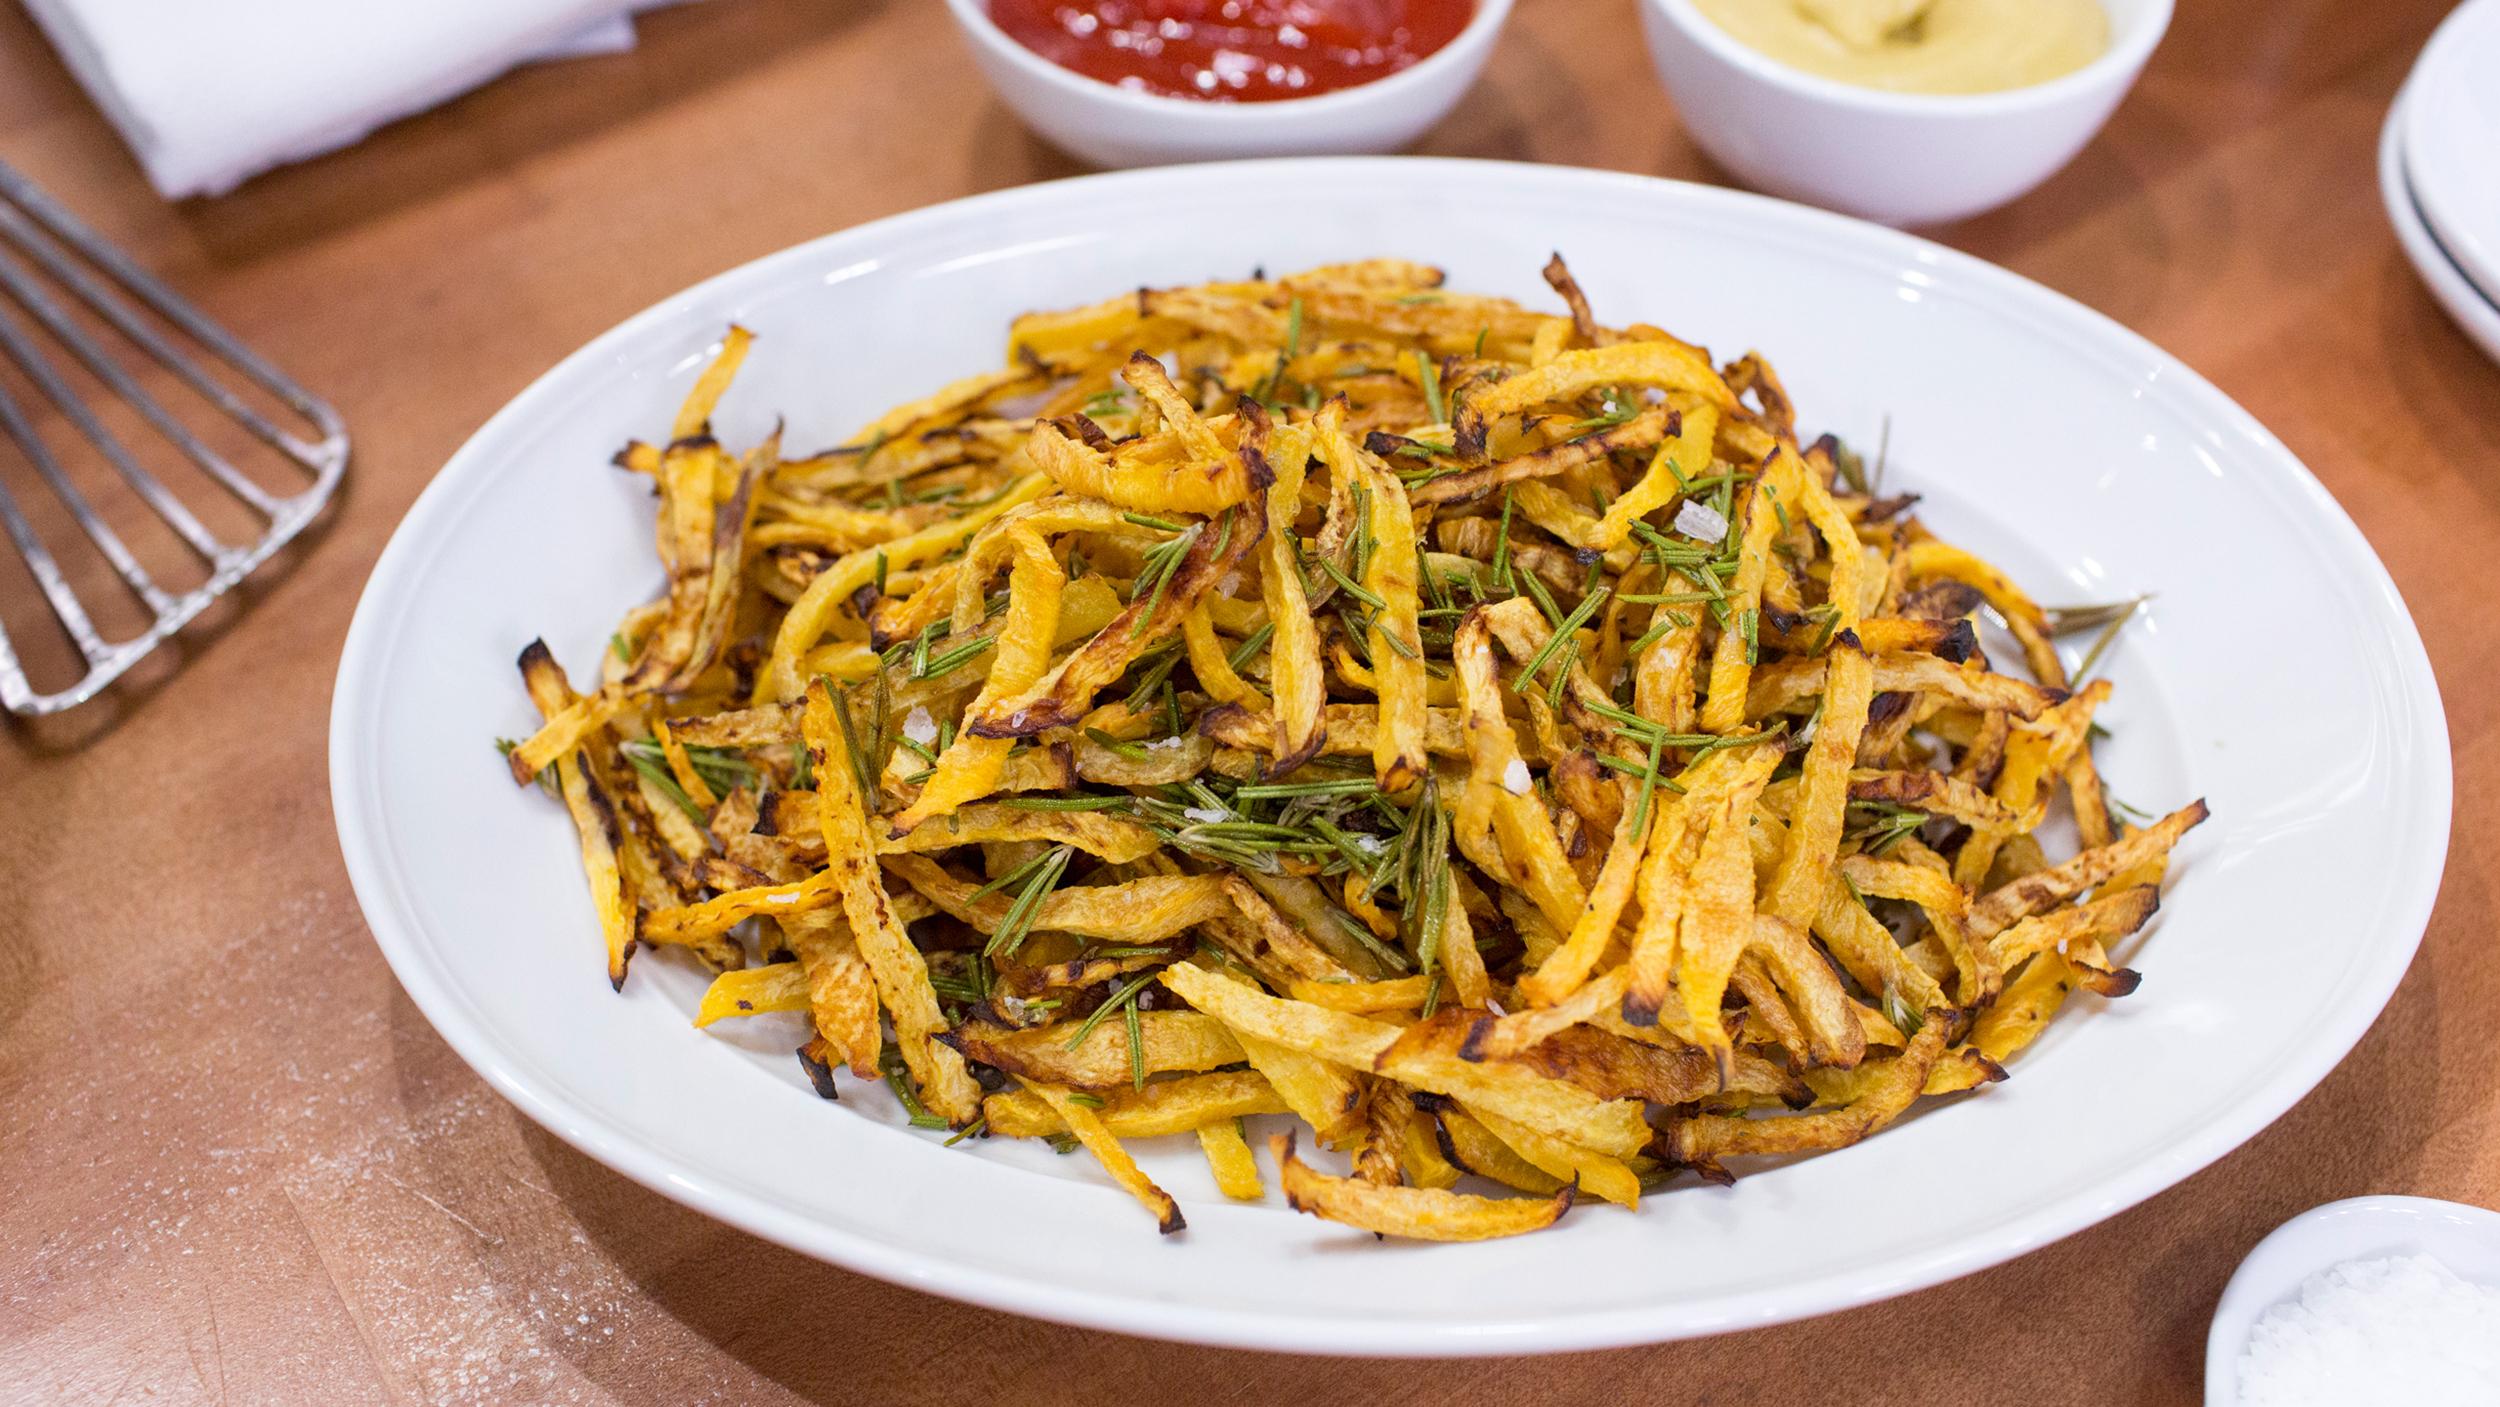 how to cut rutabaga fries